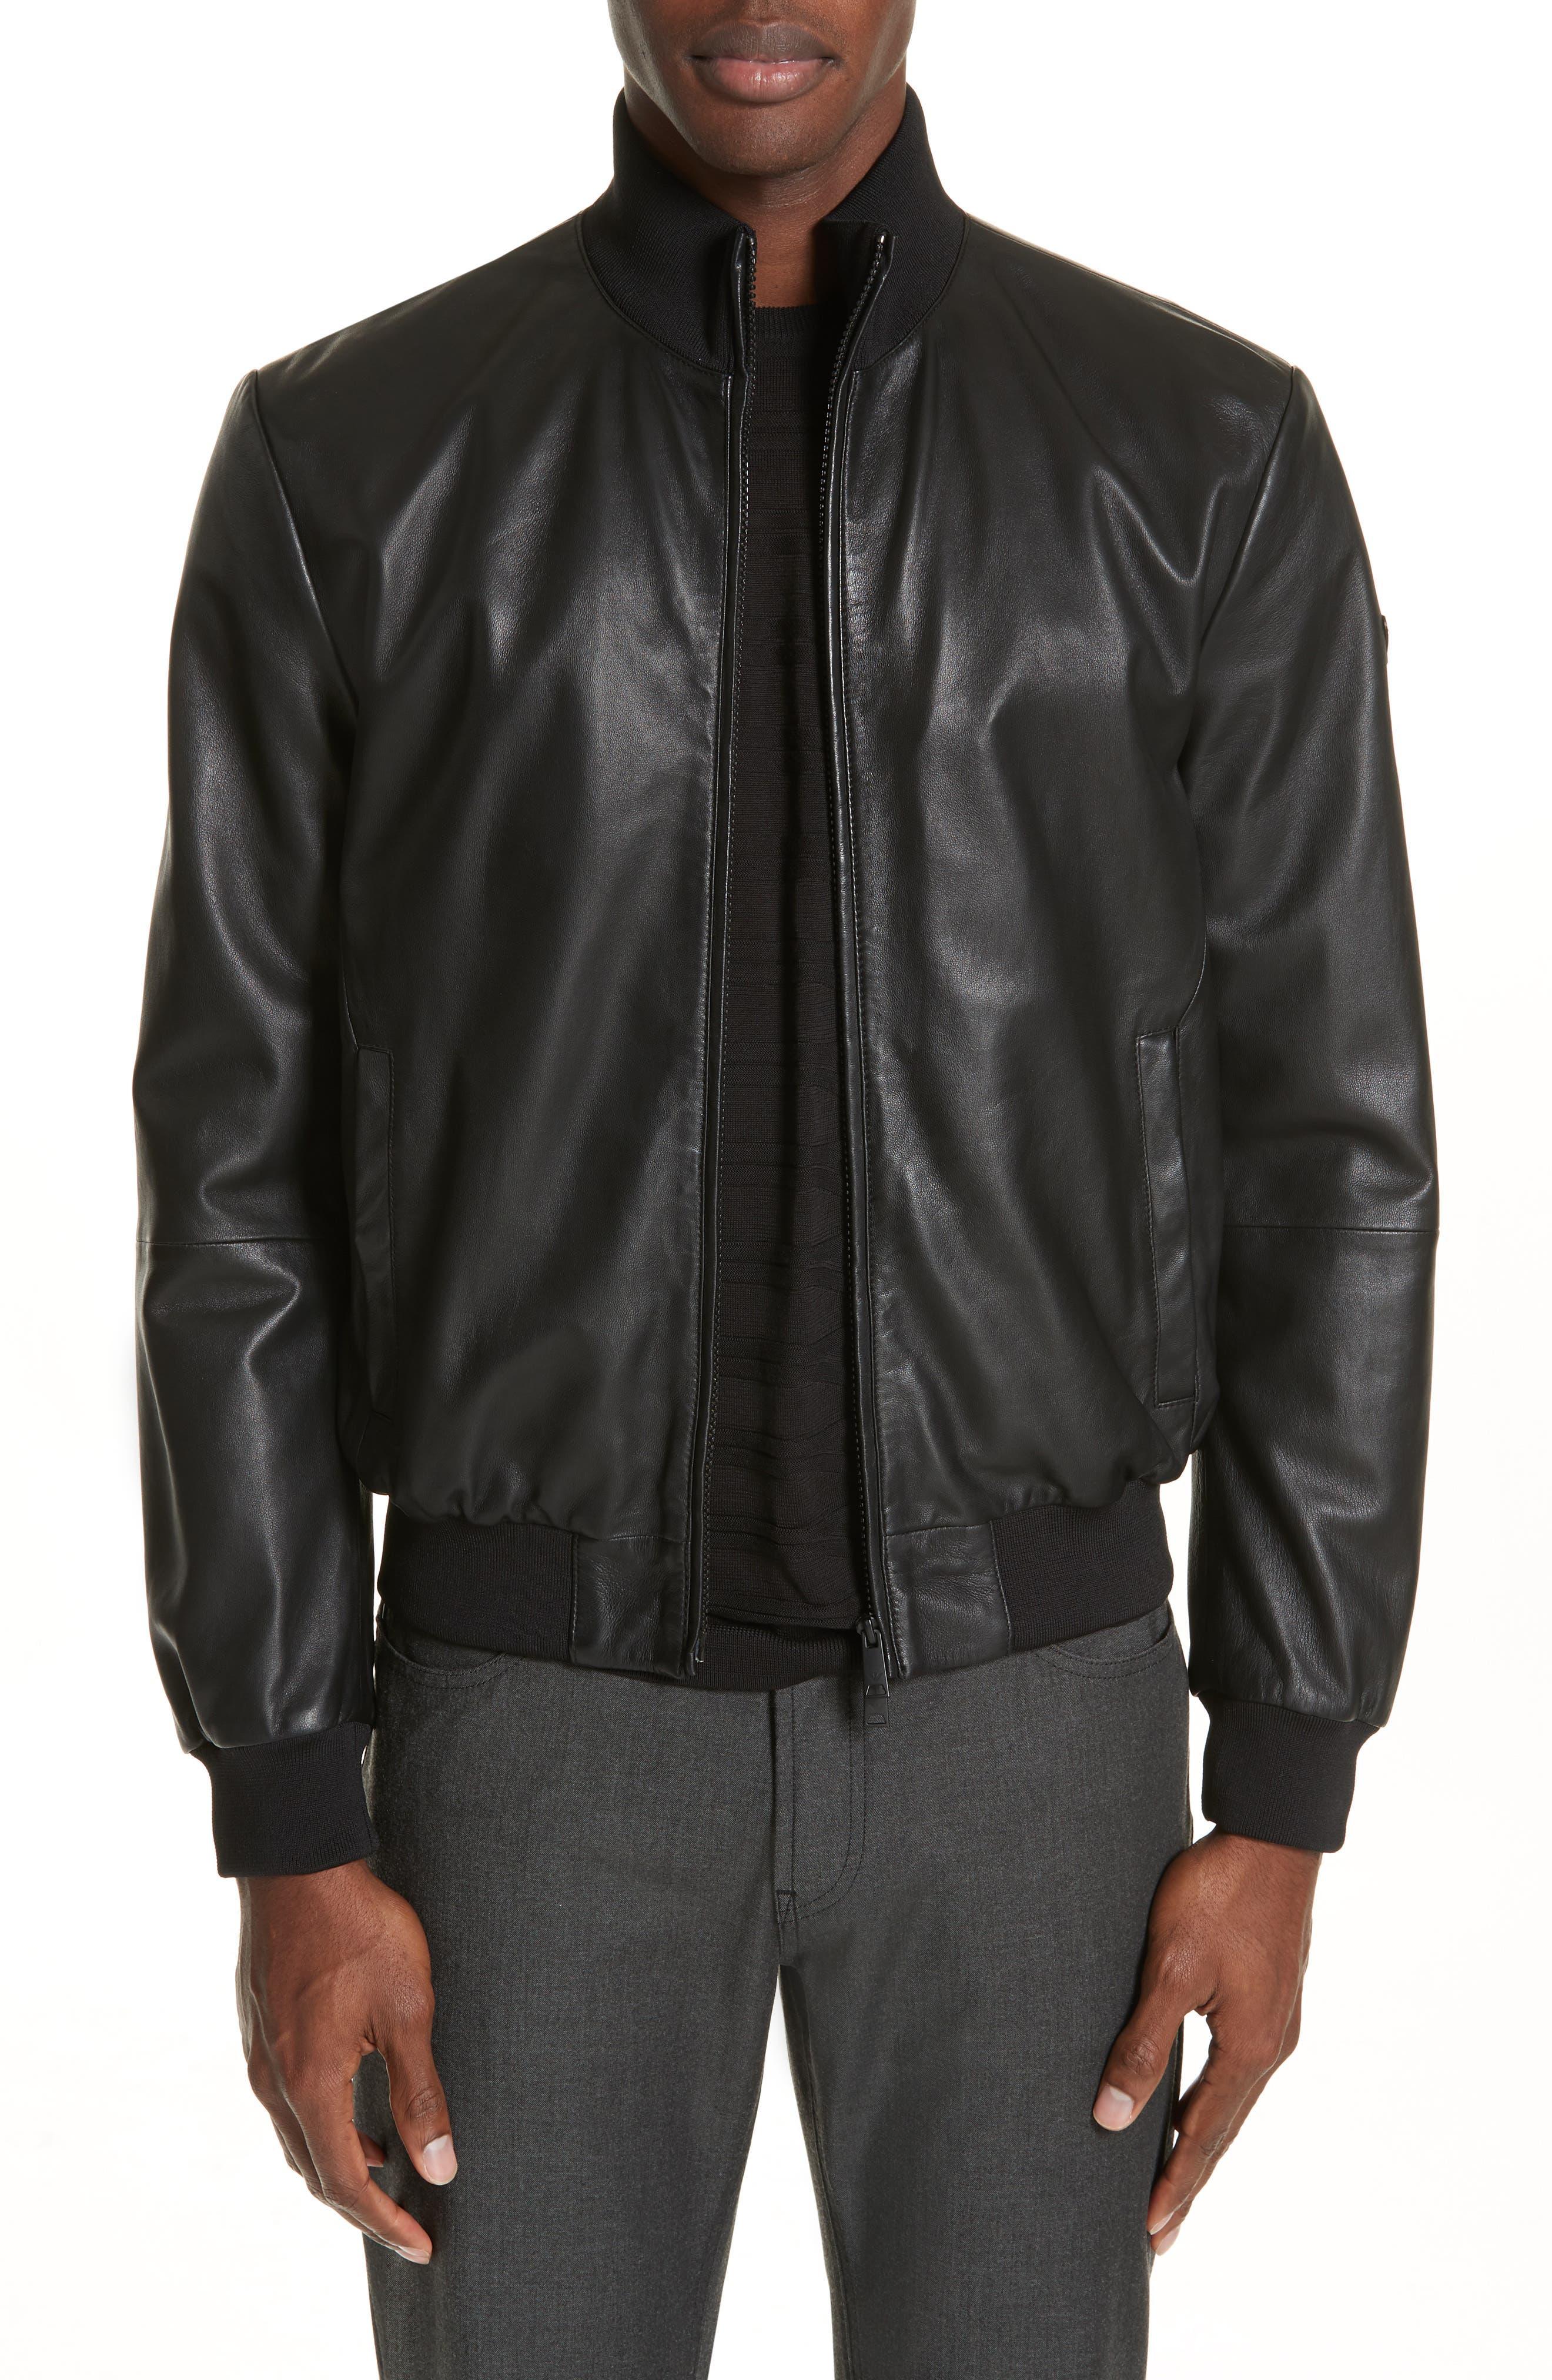 EMPORIO ARMANI, Leather Bomber Jacket, Main thumbnail 1, color, BLACK